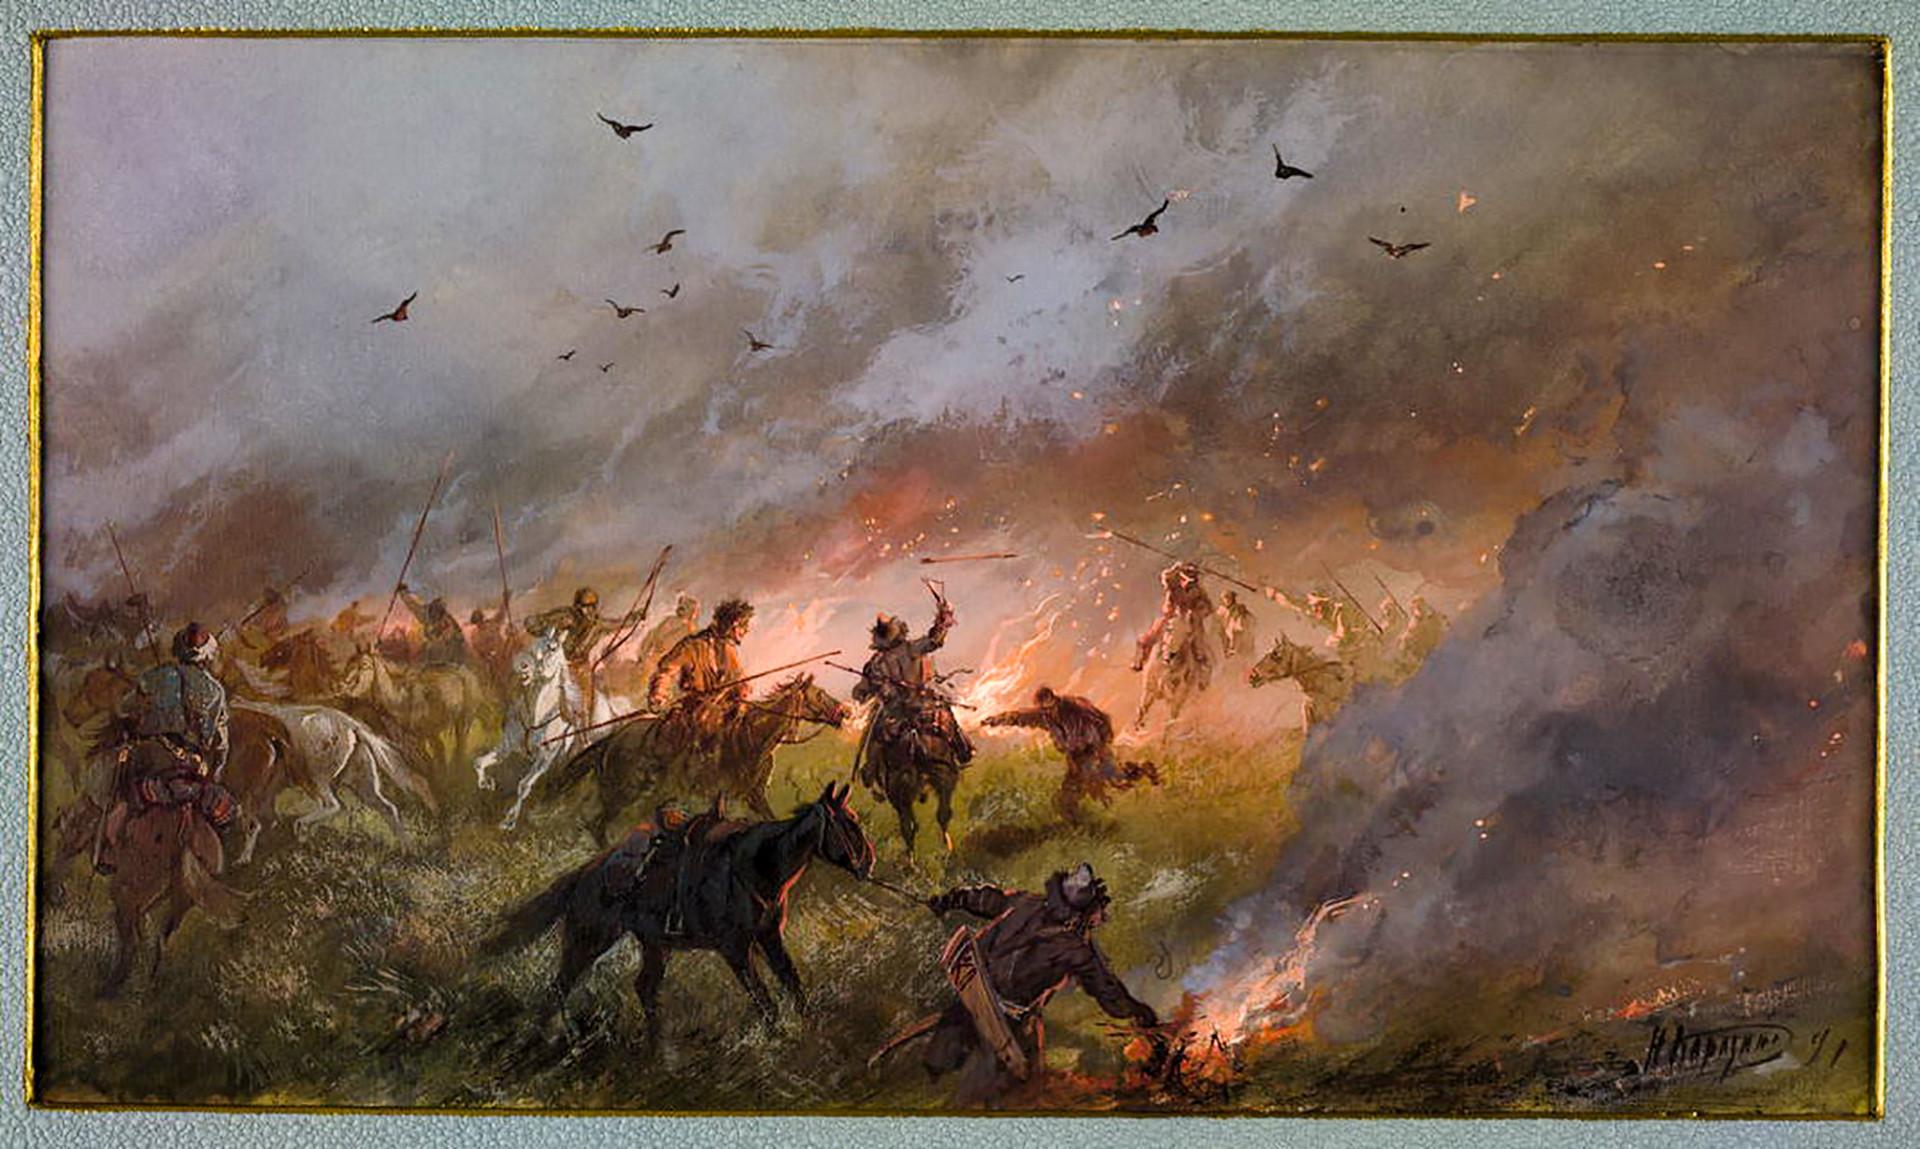 Pemberontakan Pugachyov di Siberia karya Nikolay Karazin